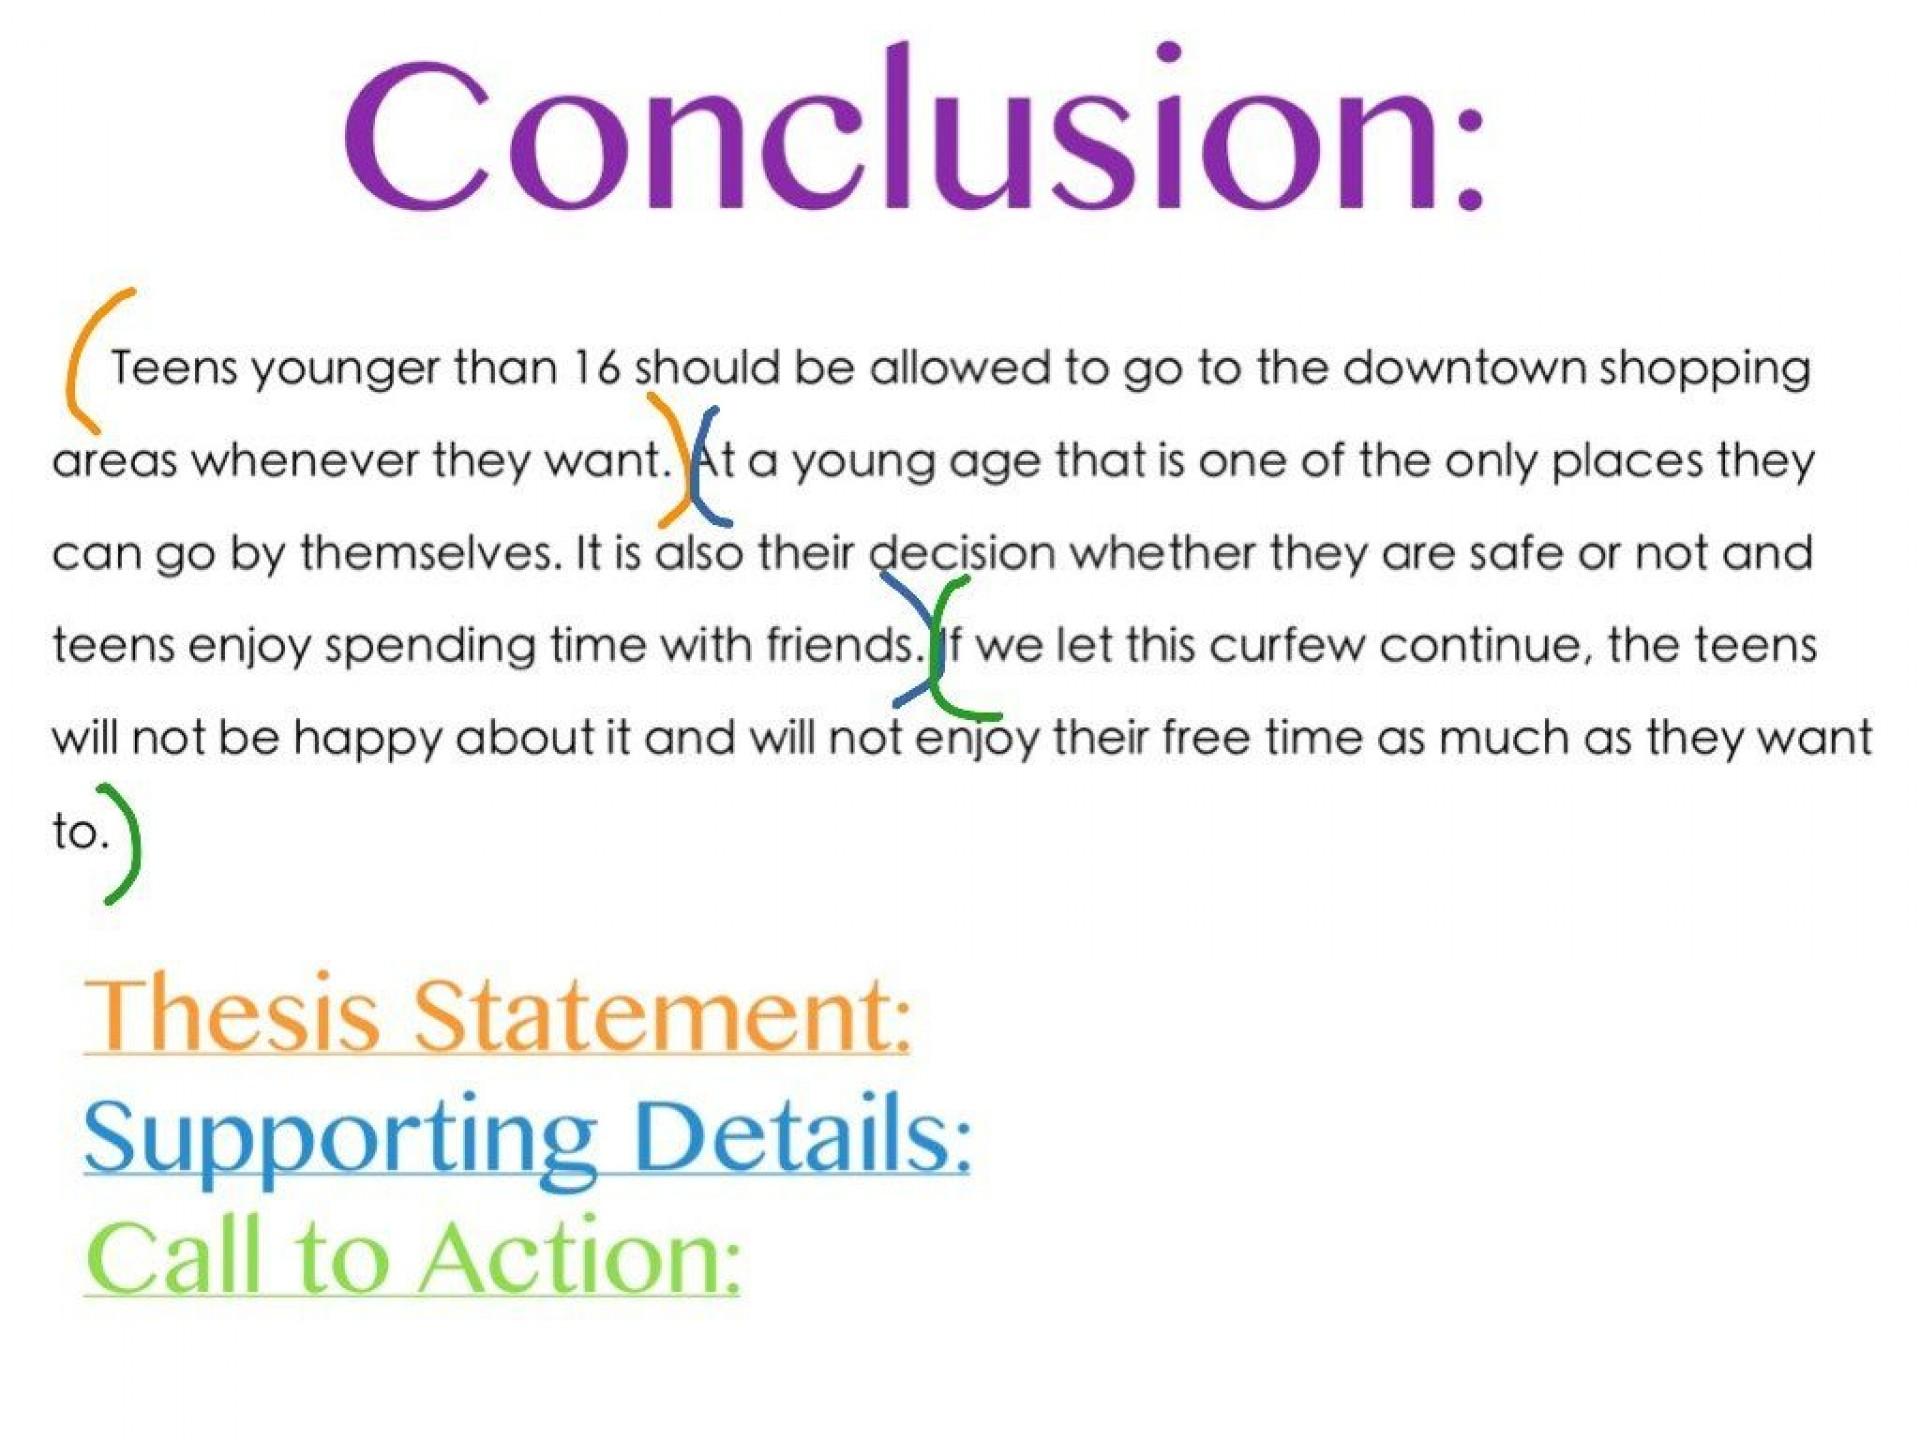 003 Essay Example Persuasive Impressive Conclusion Paragraph Examples Structure 1920